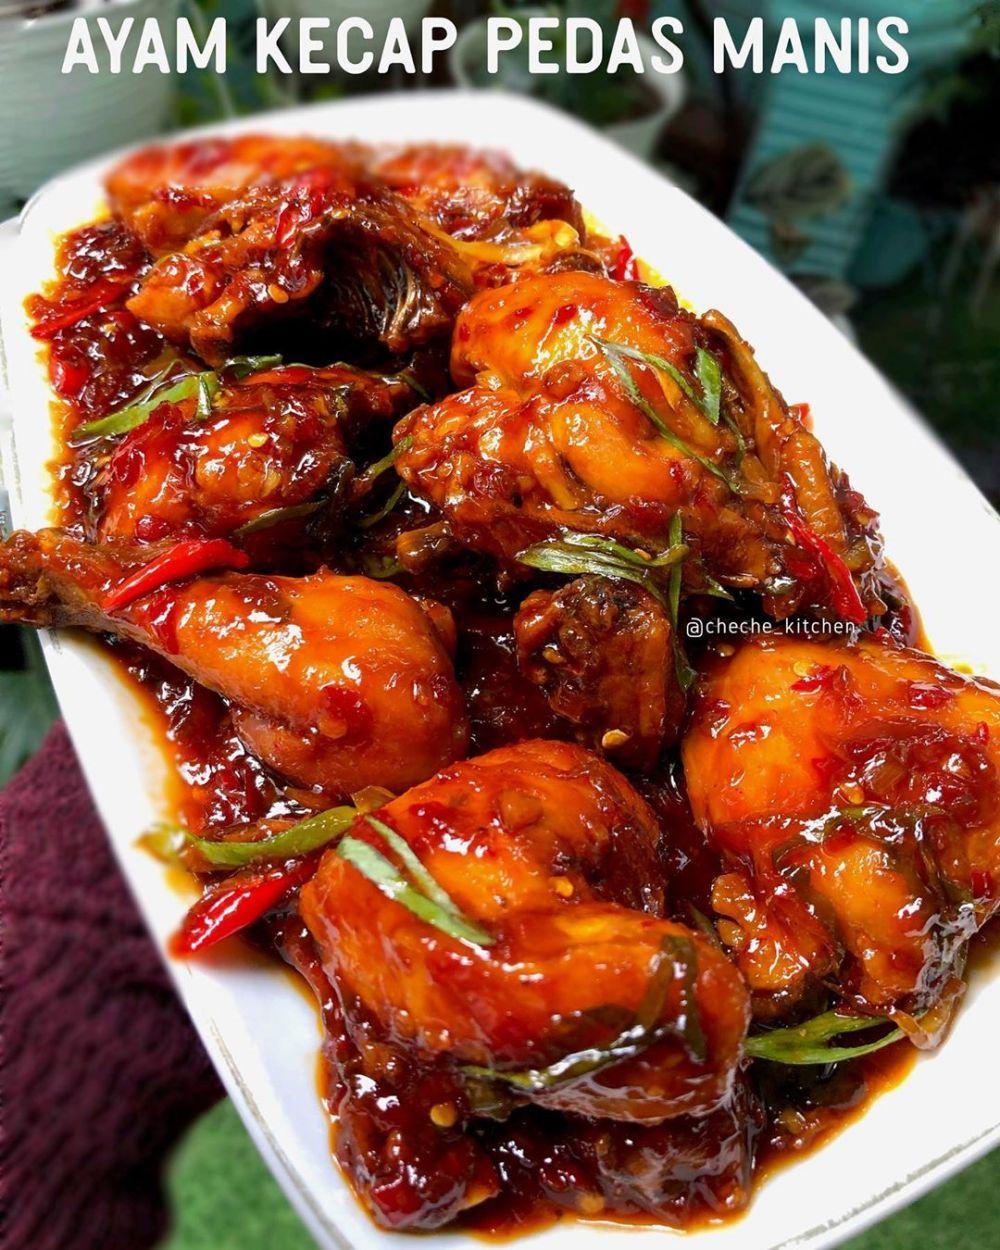 Resep Ayam Kecap Spesial Instagram Di 2020 Resep Ayam Resep Masakan Resep Sayap Ayam